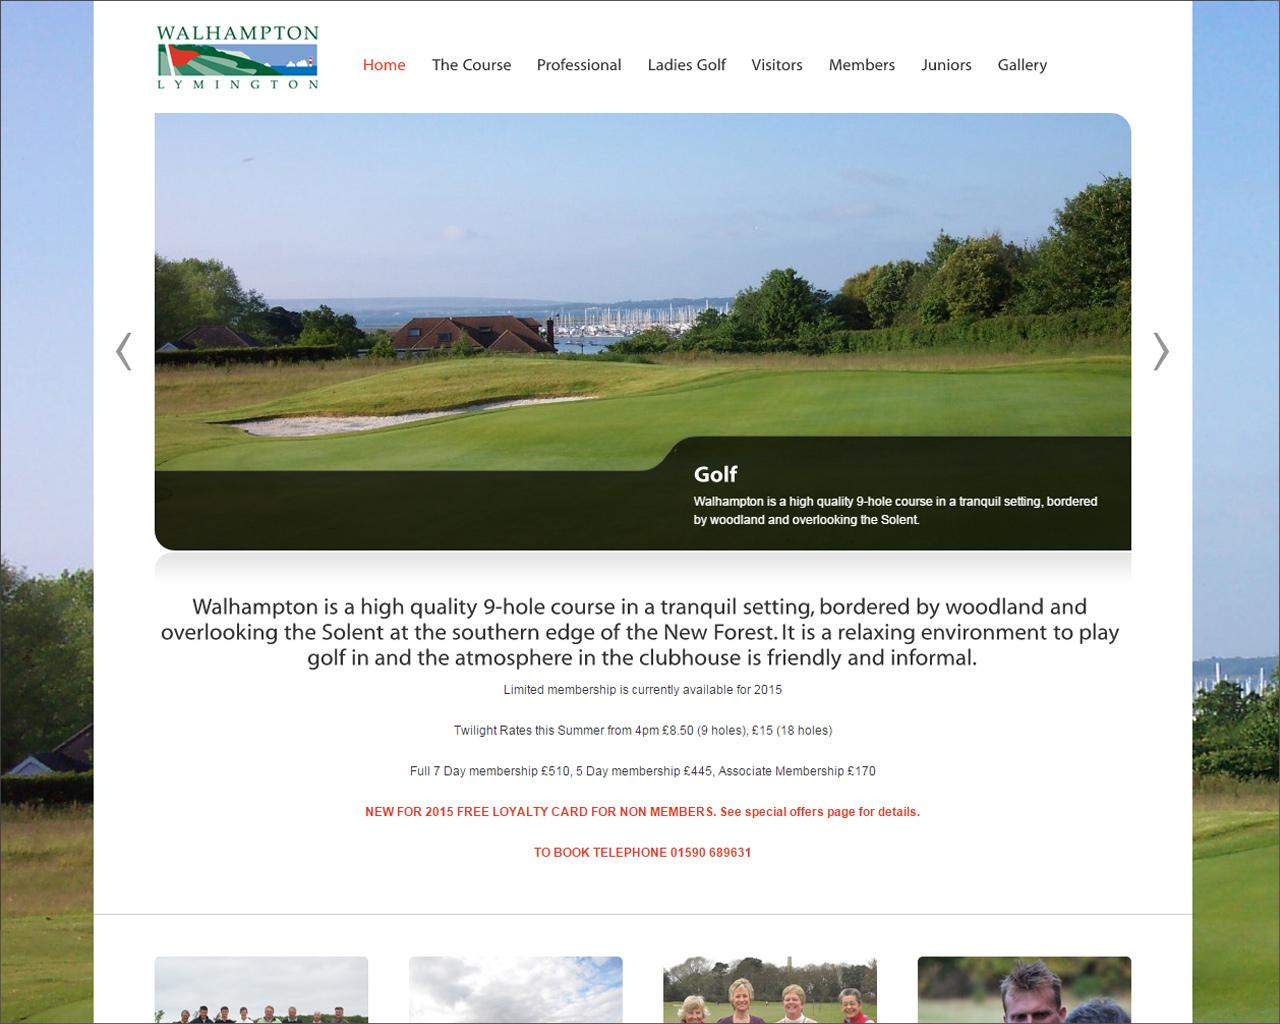 Walhampton Golf Course